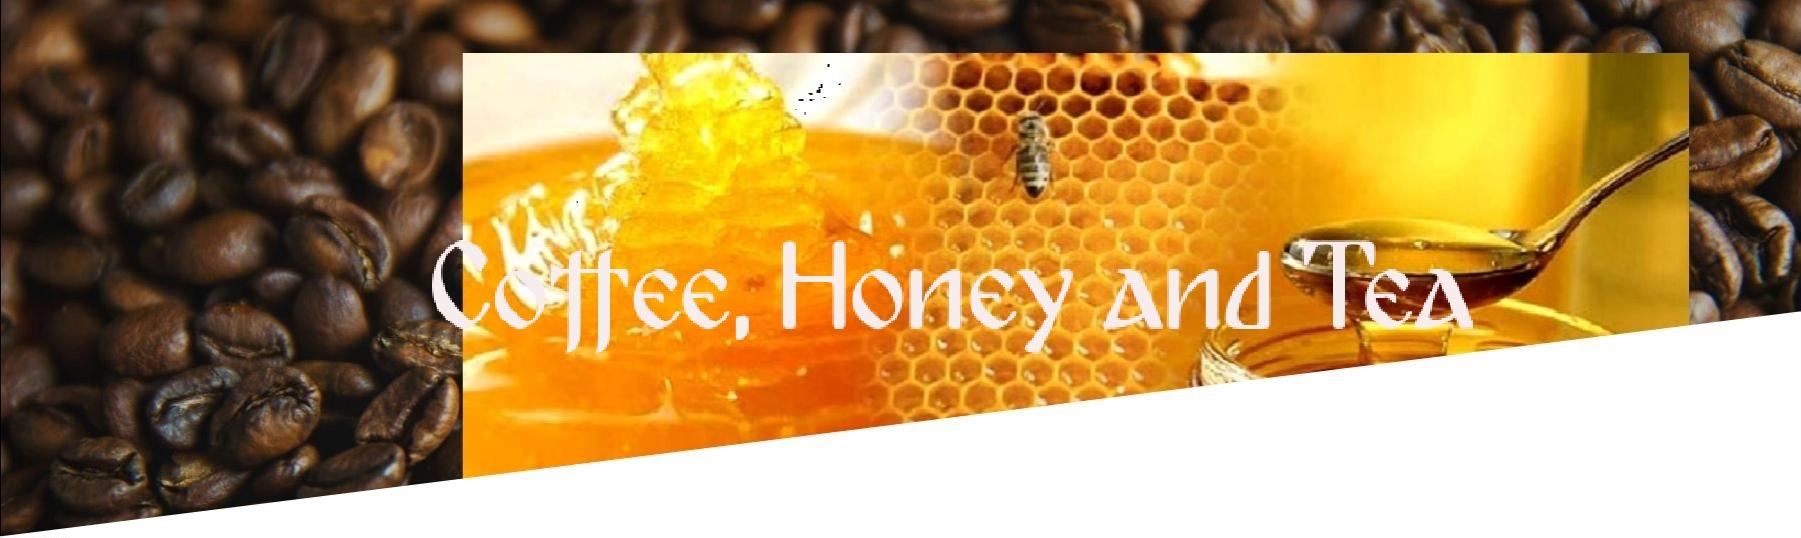 coffee-honey-and-tea